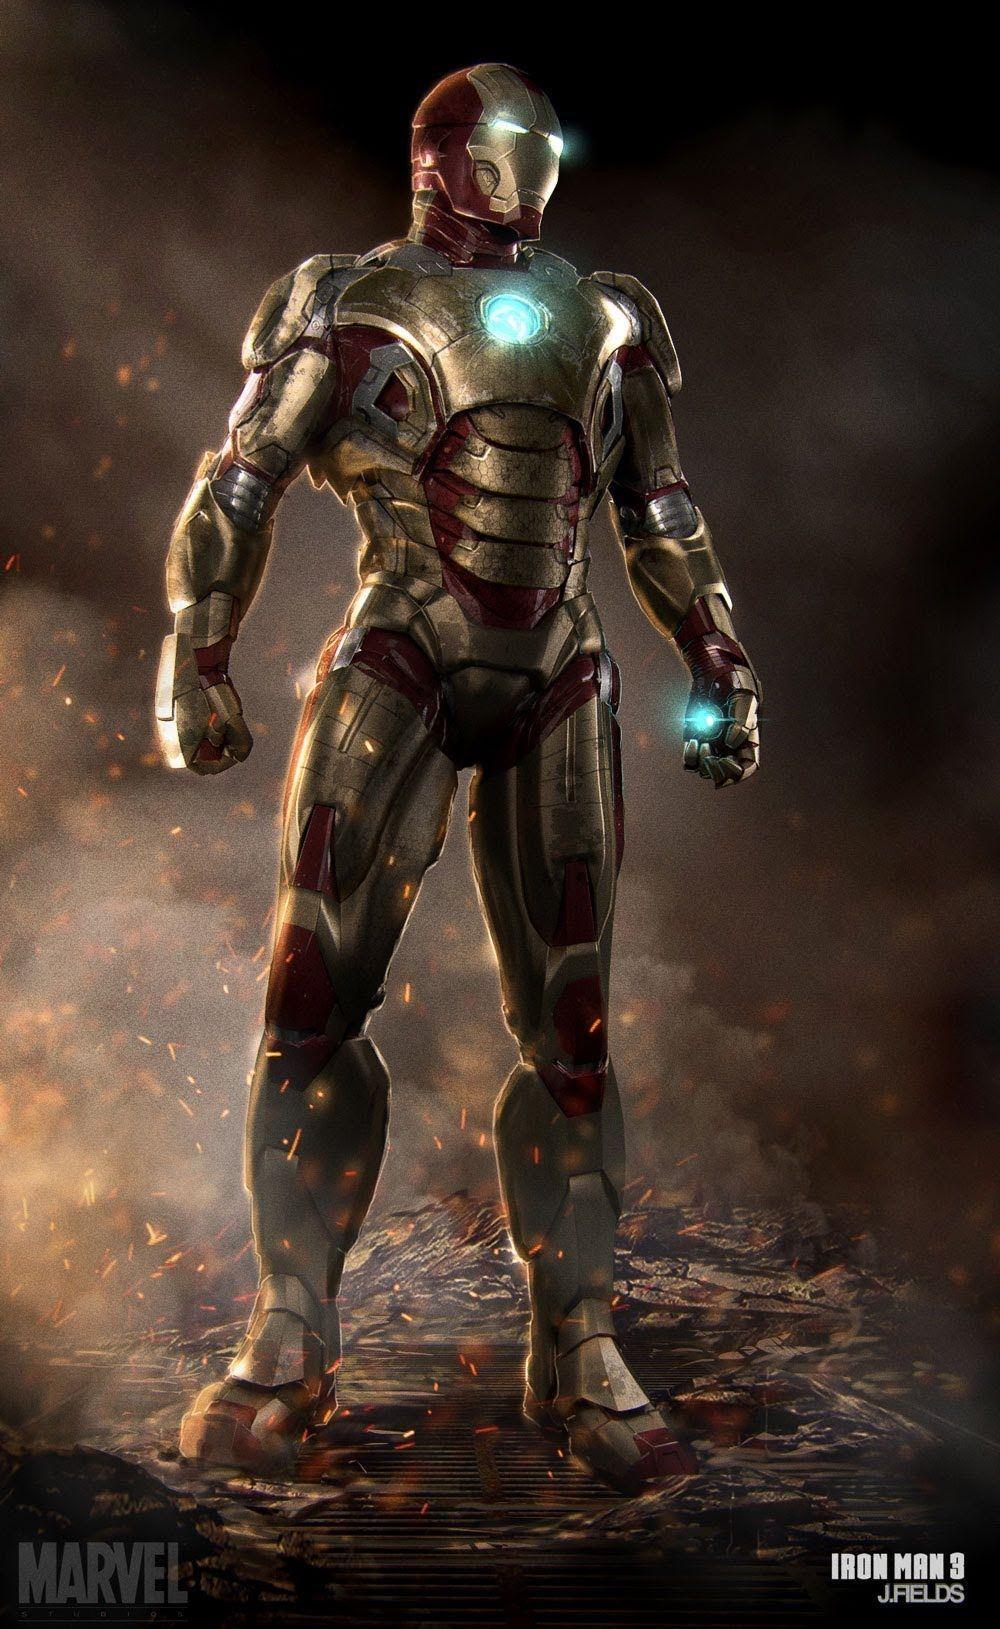 Iron Man Wallpaper 34447: Iron Man Mark 50 Wallpapers